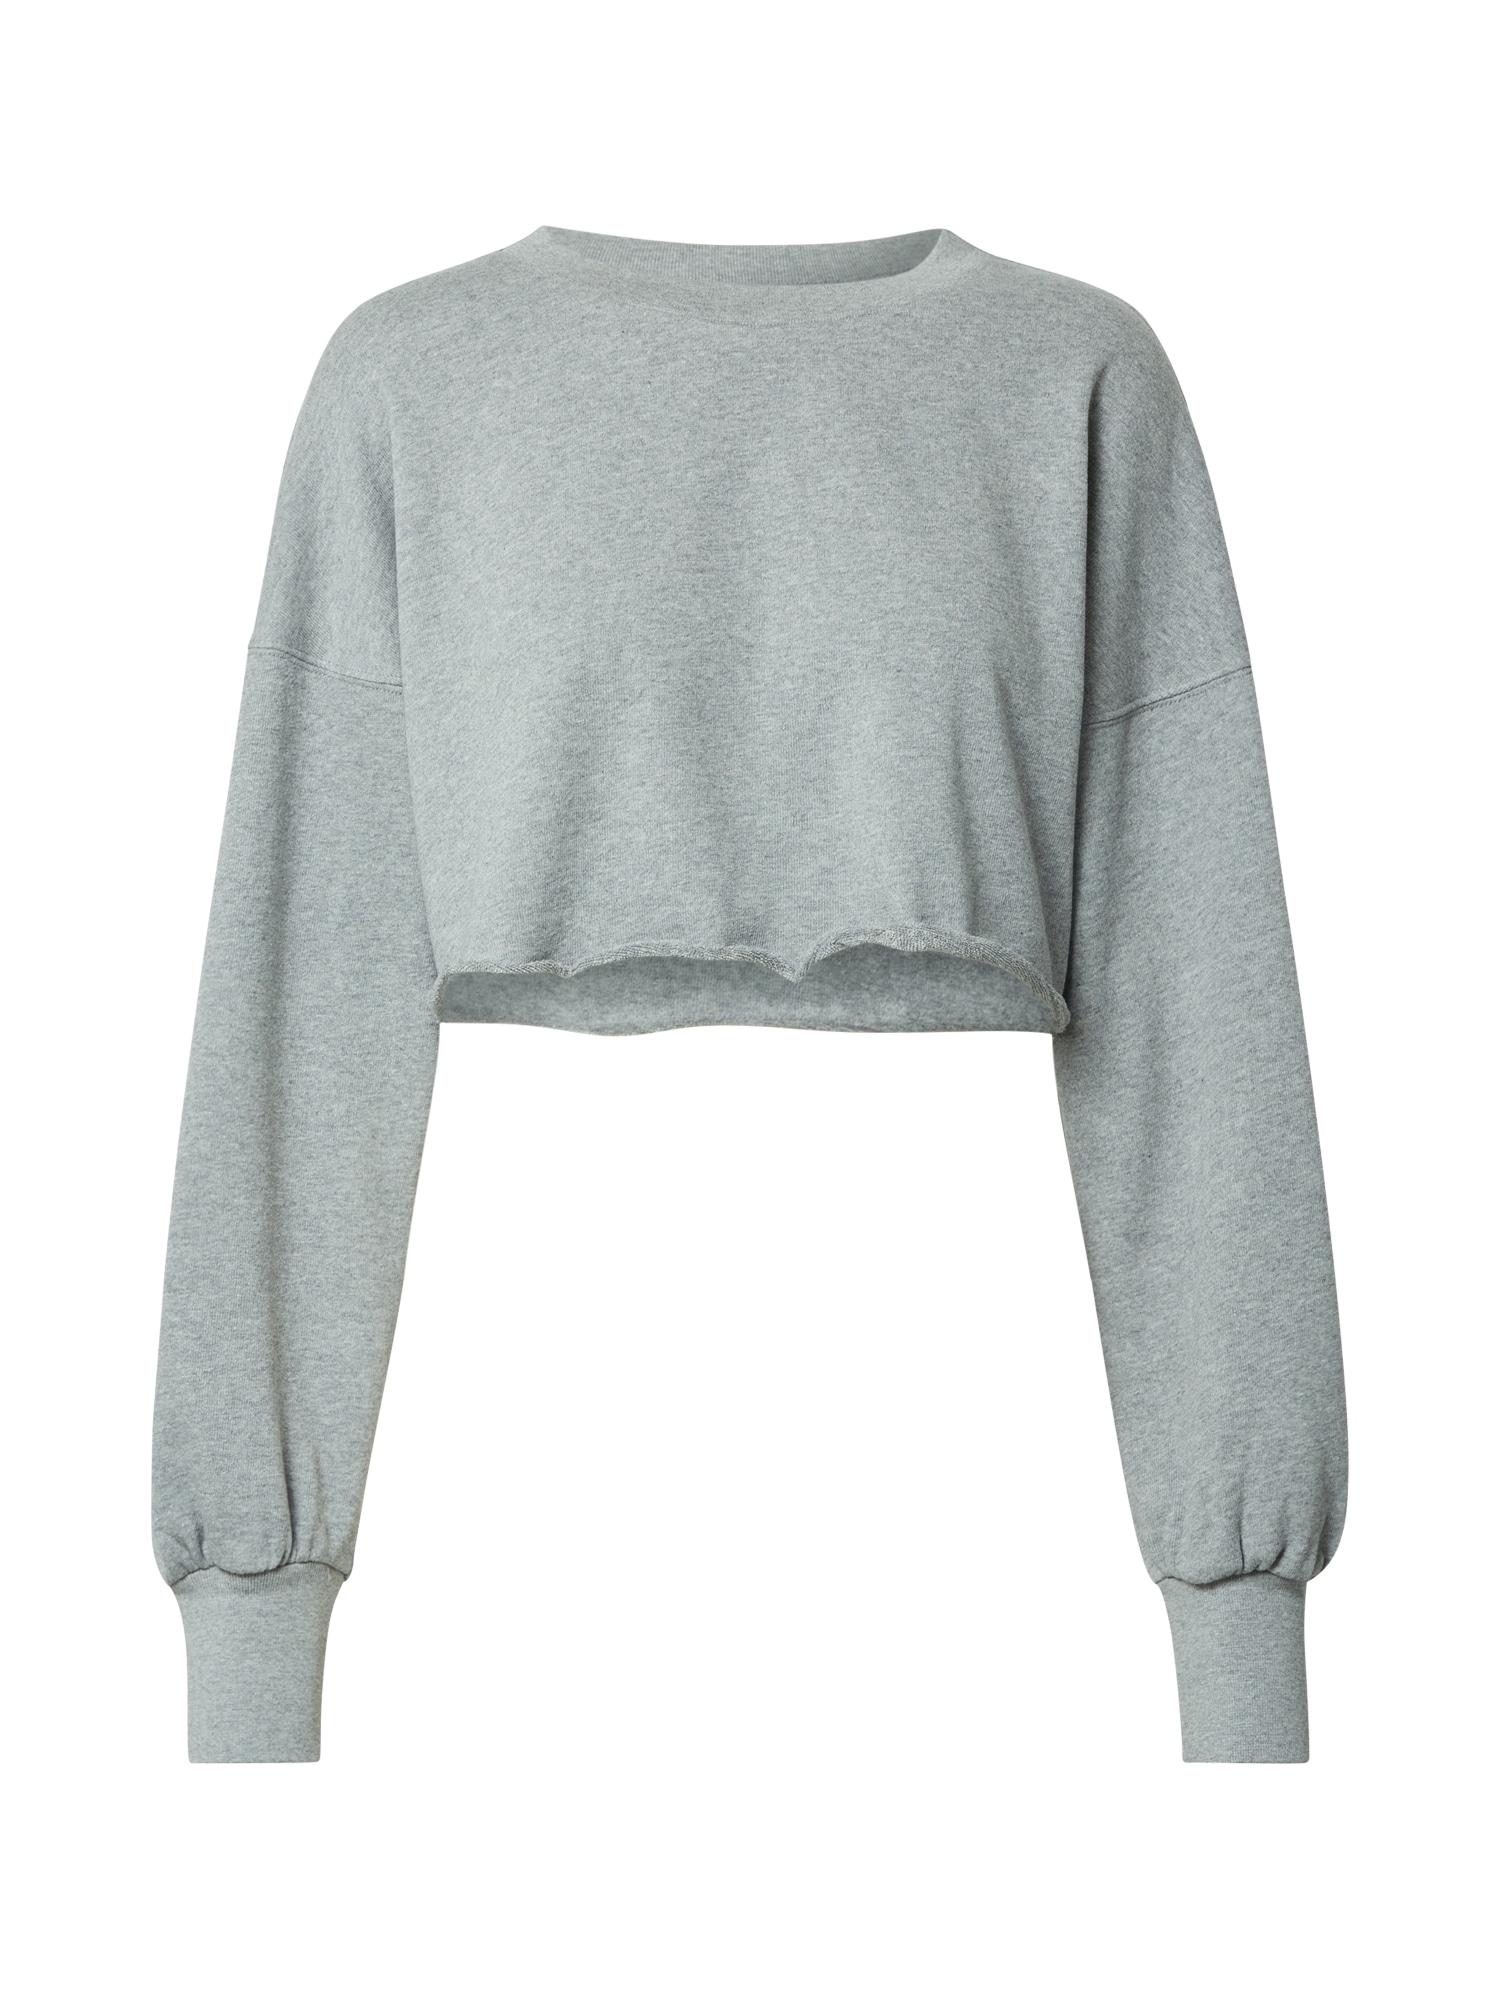 NU-IN Sportinio tipo megztinis pilka